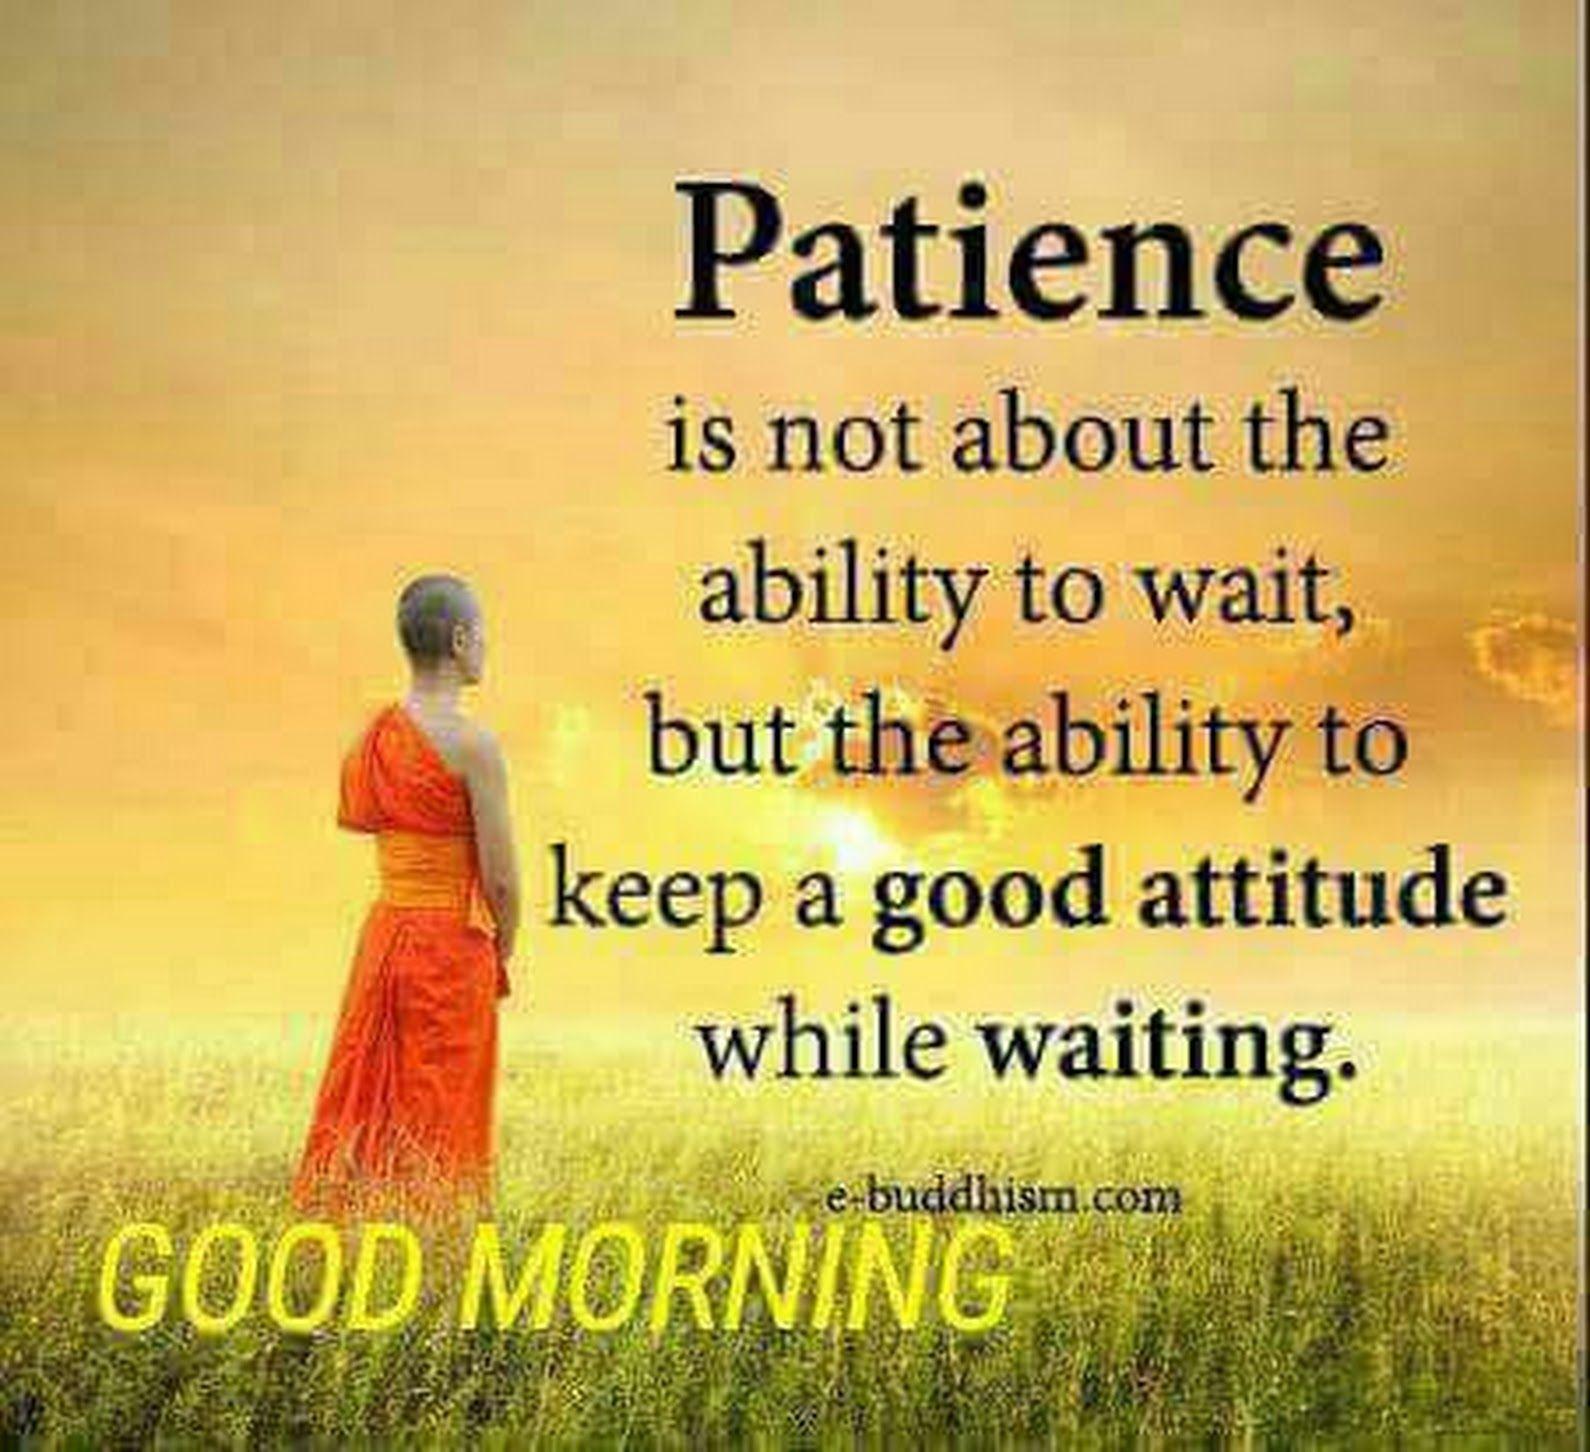 Good Morning Happy Life Quotes: Good Morning Friends.... - Shilpa Rao - Google+